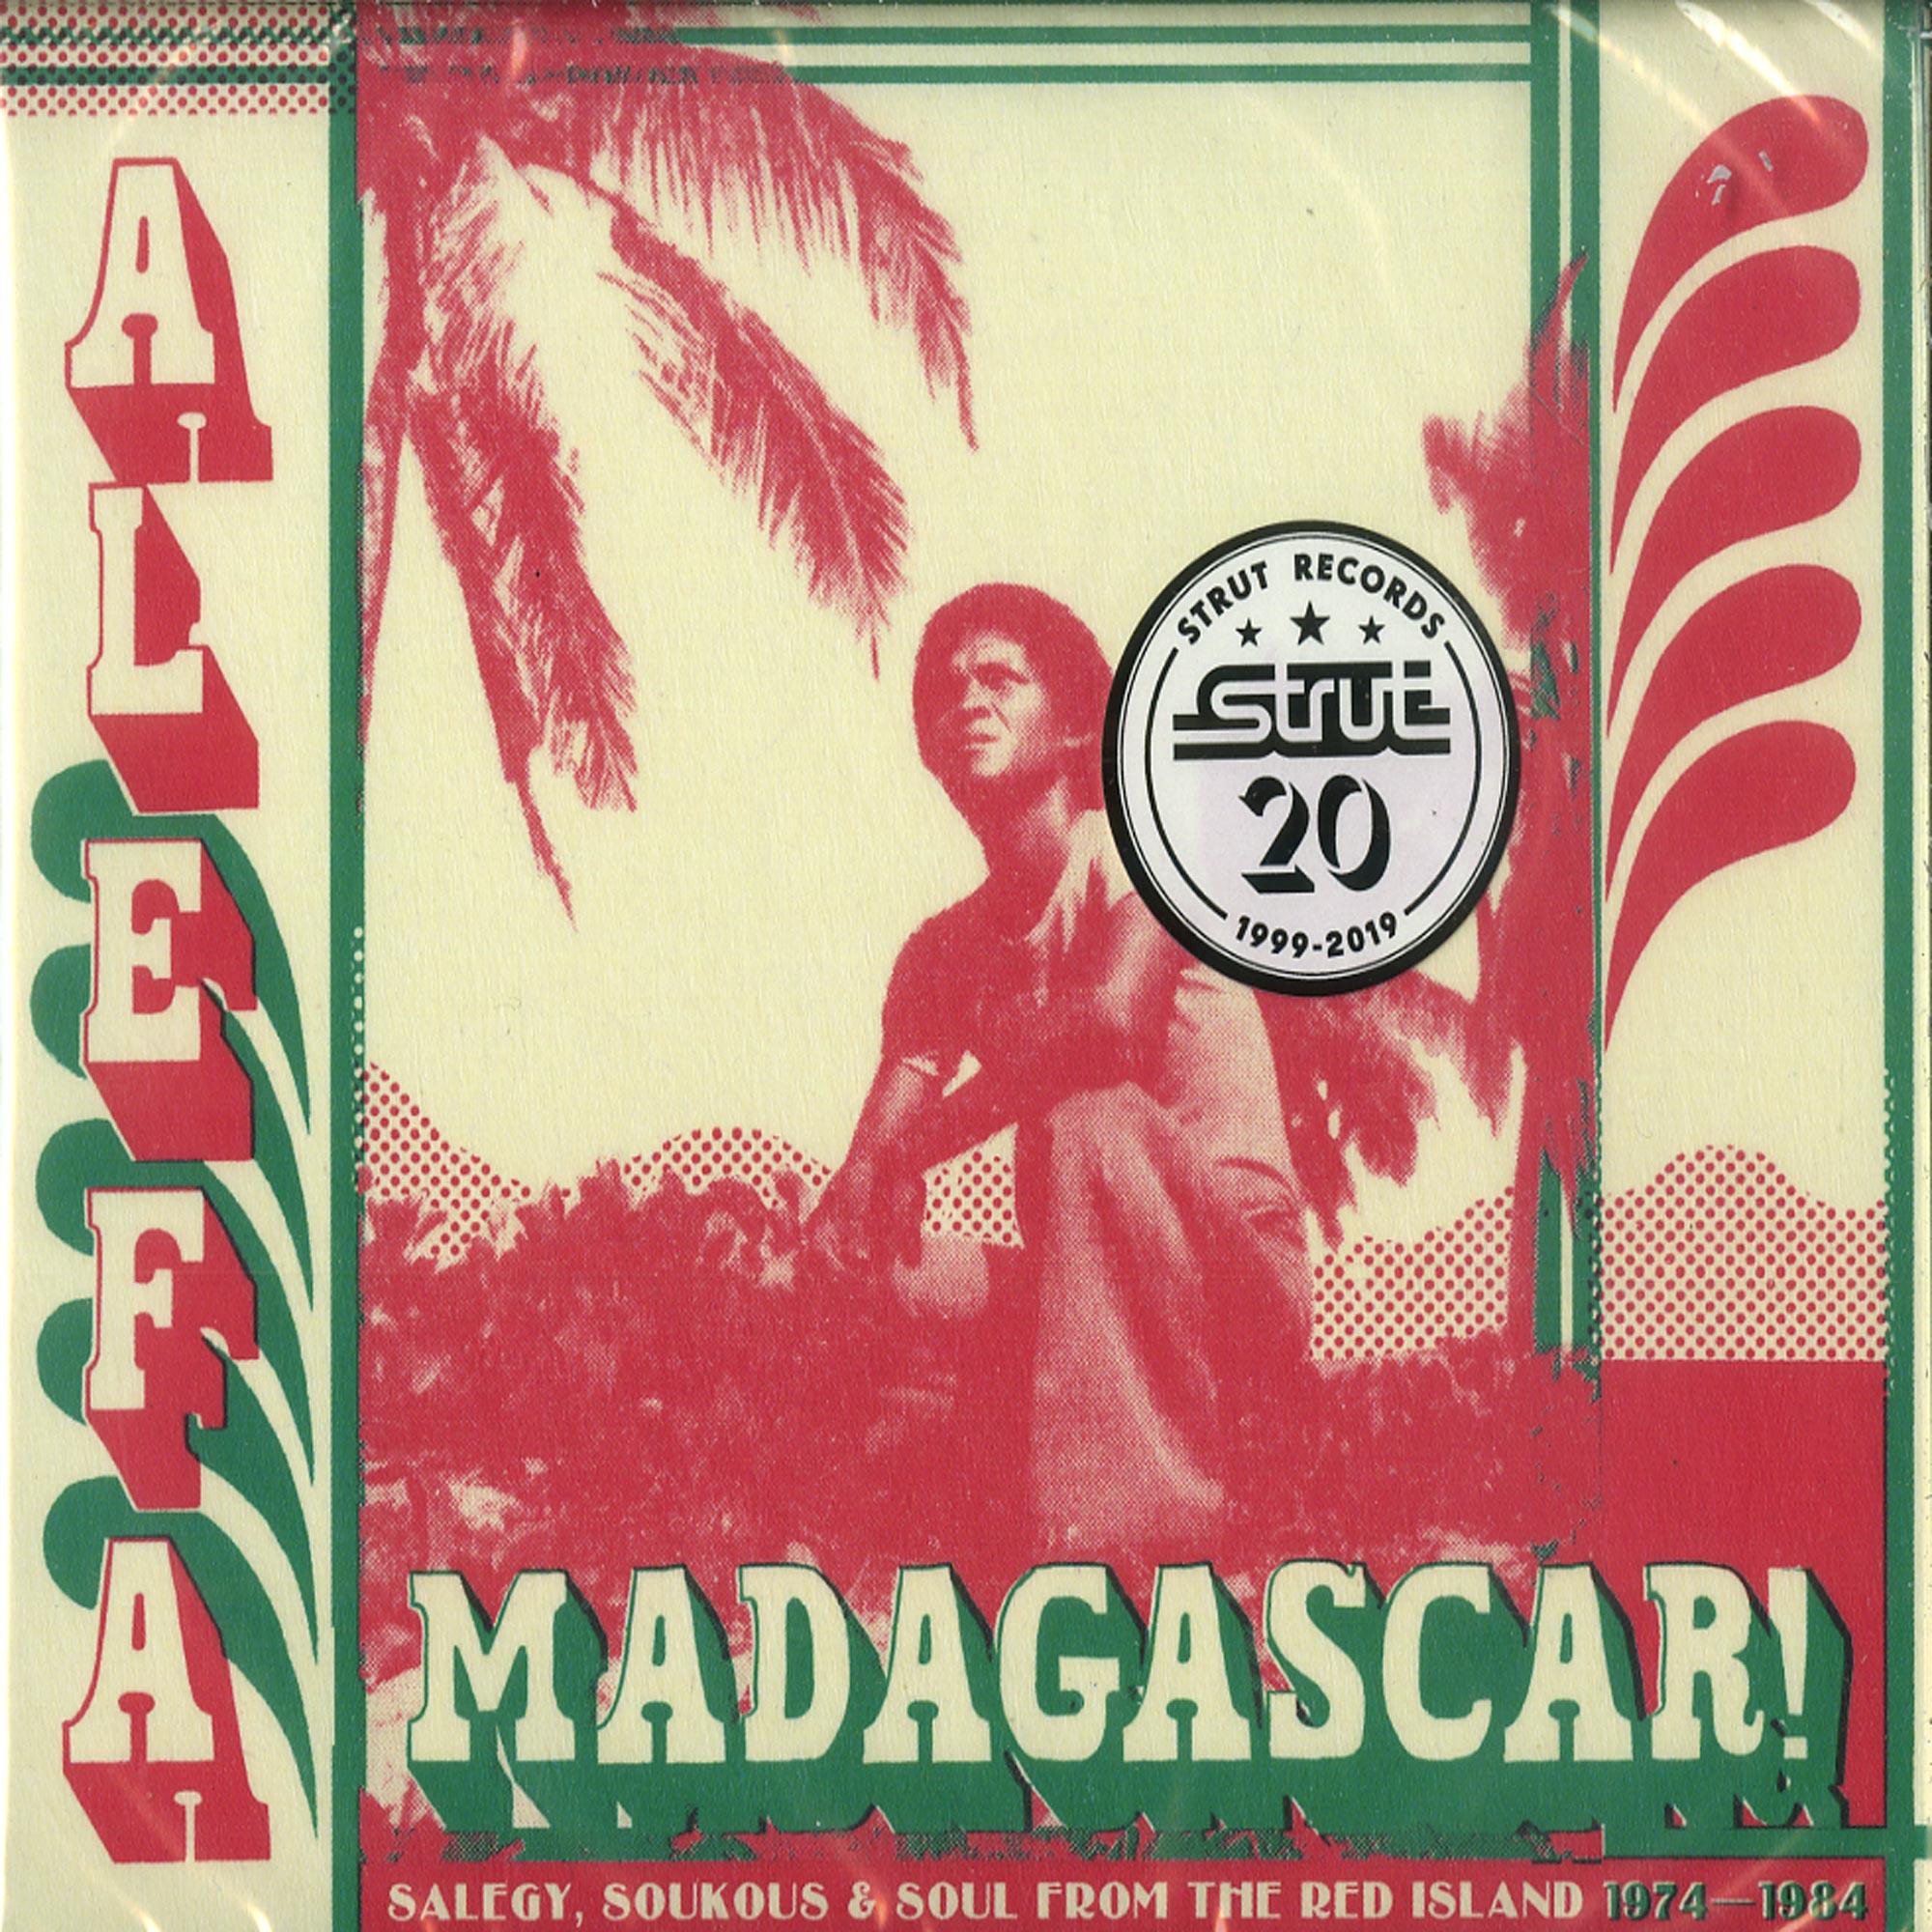 Various Artists - ALEFA MADAGASCAR - SALEGY, SOUKOUS & SOUL 1974 - 1984